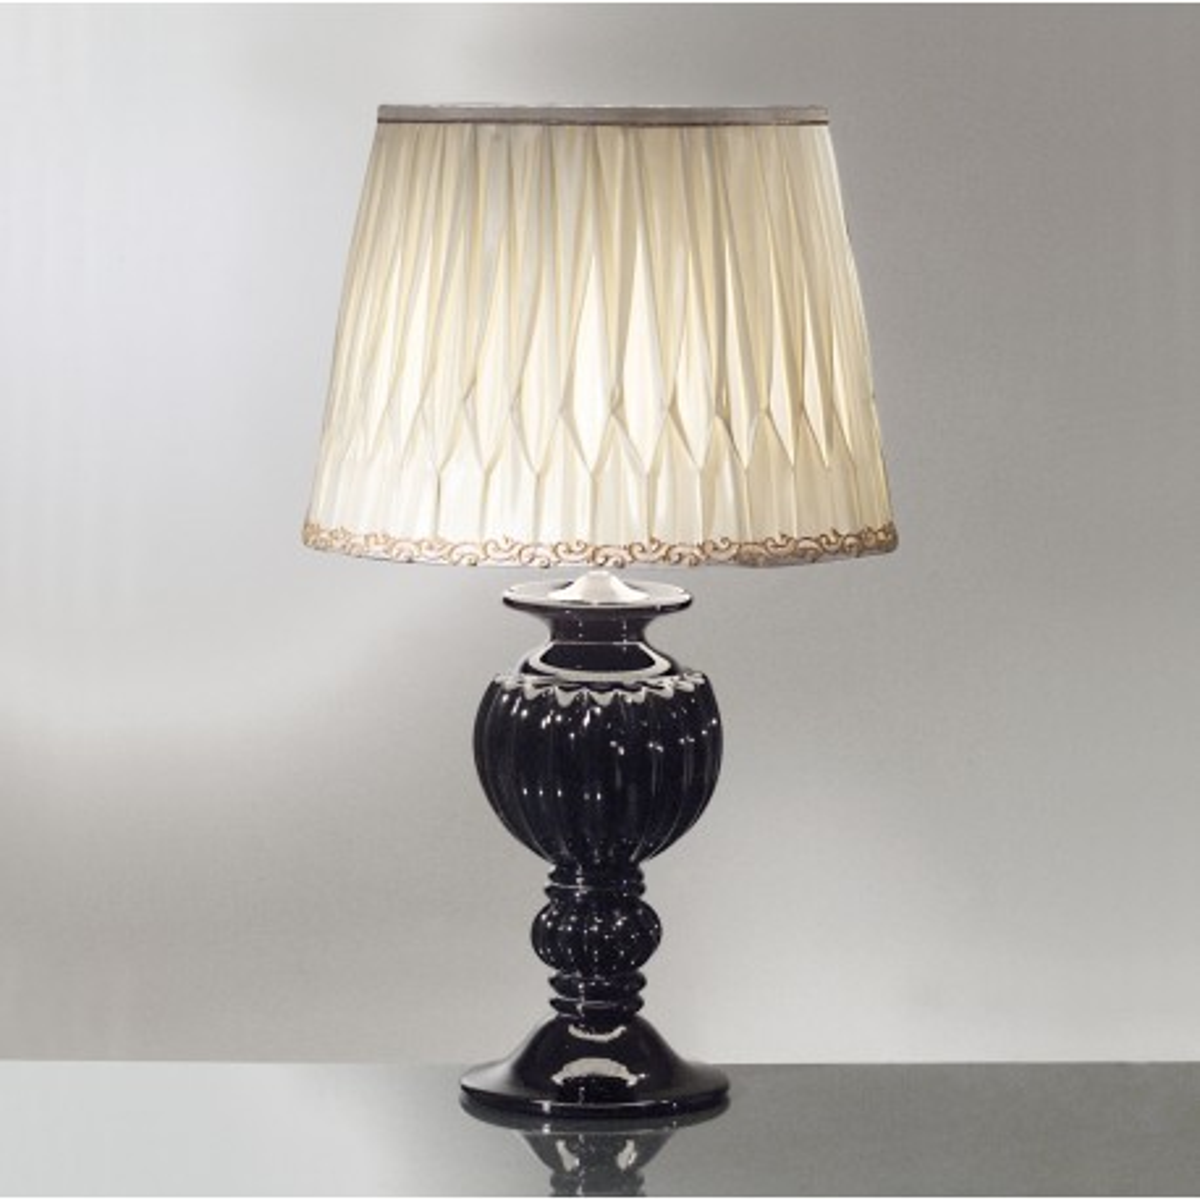 """Tersicore"" lampe de table en verre de Murano - 1 lumiere - noir"